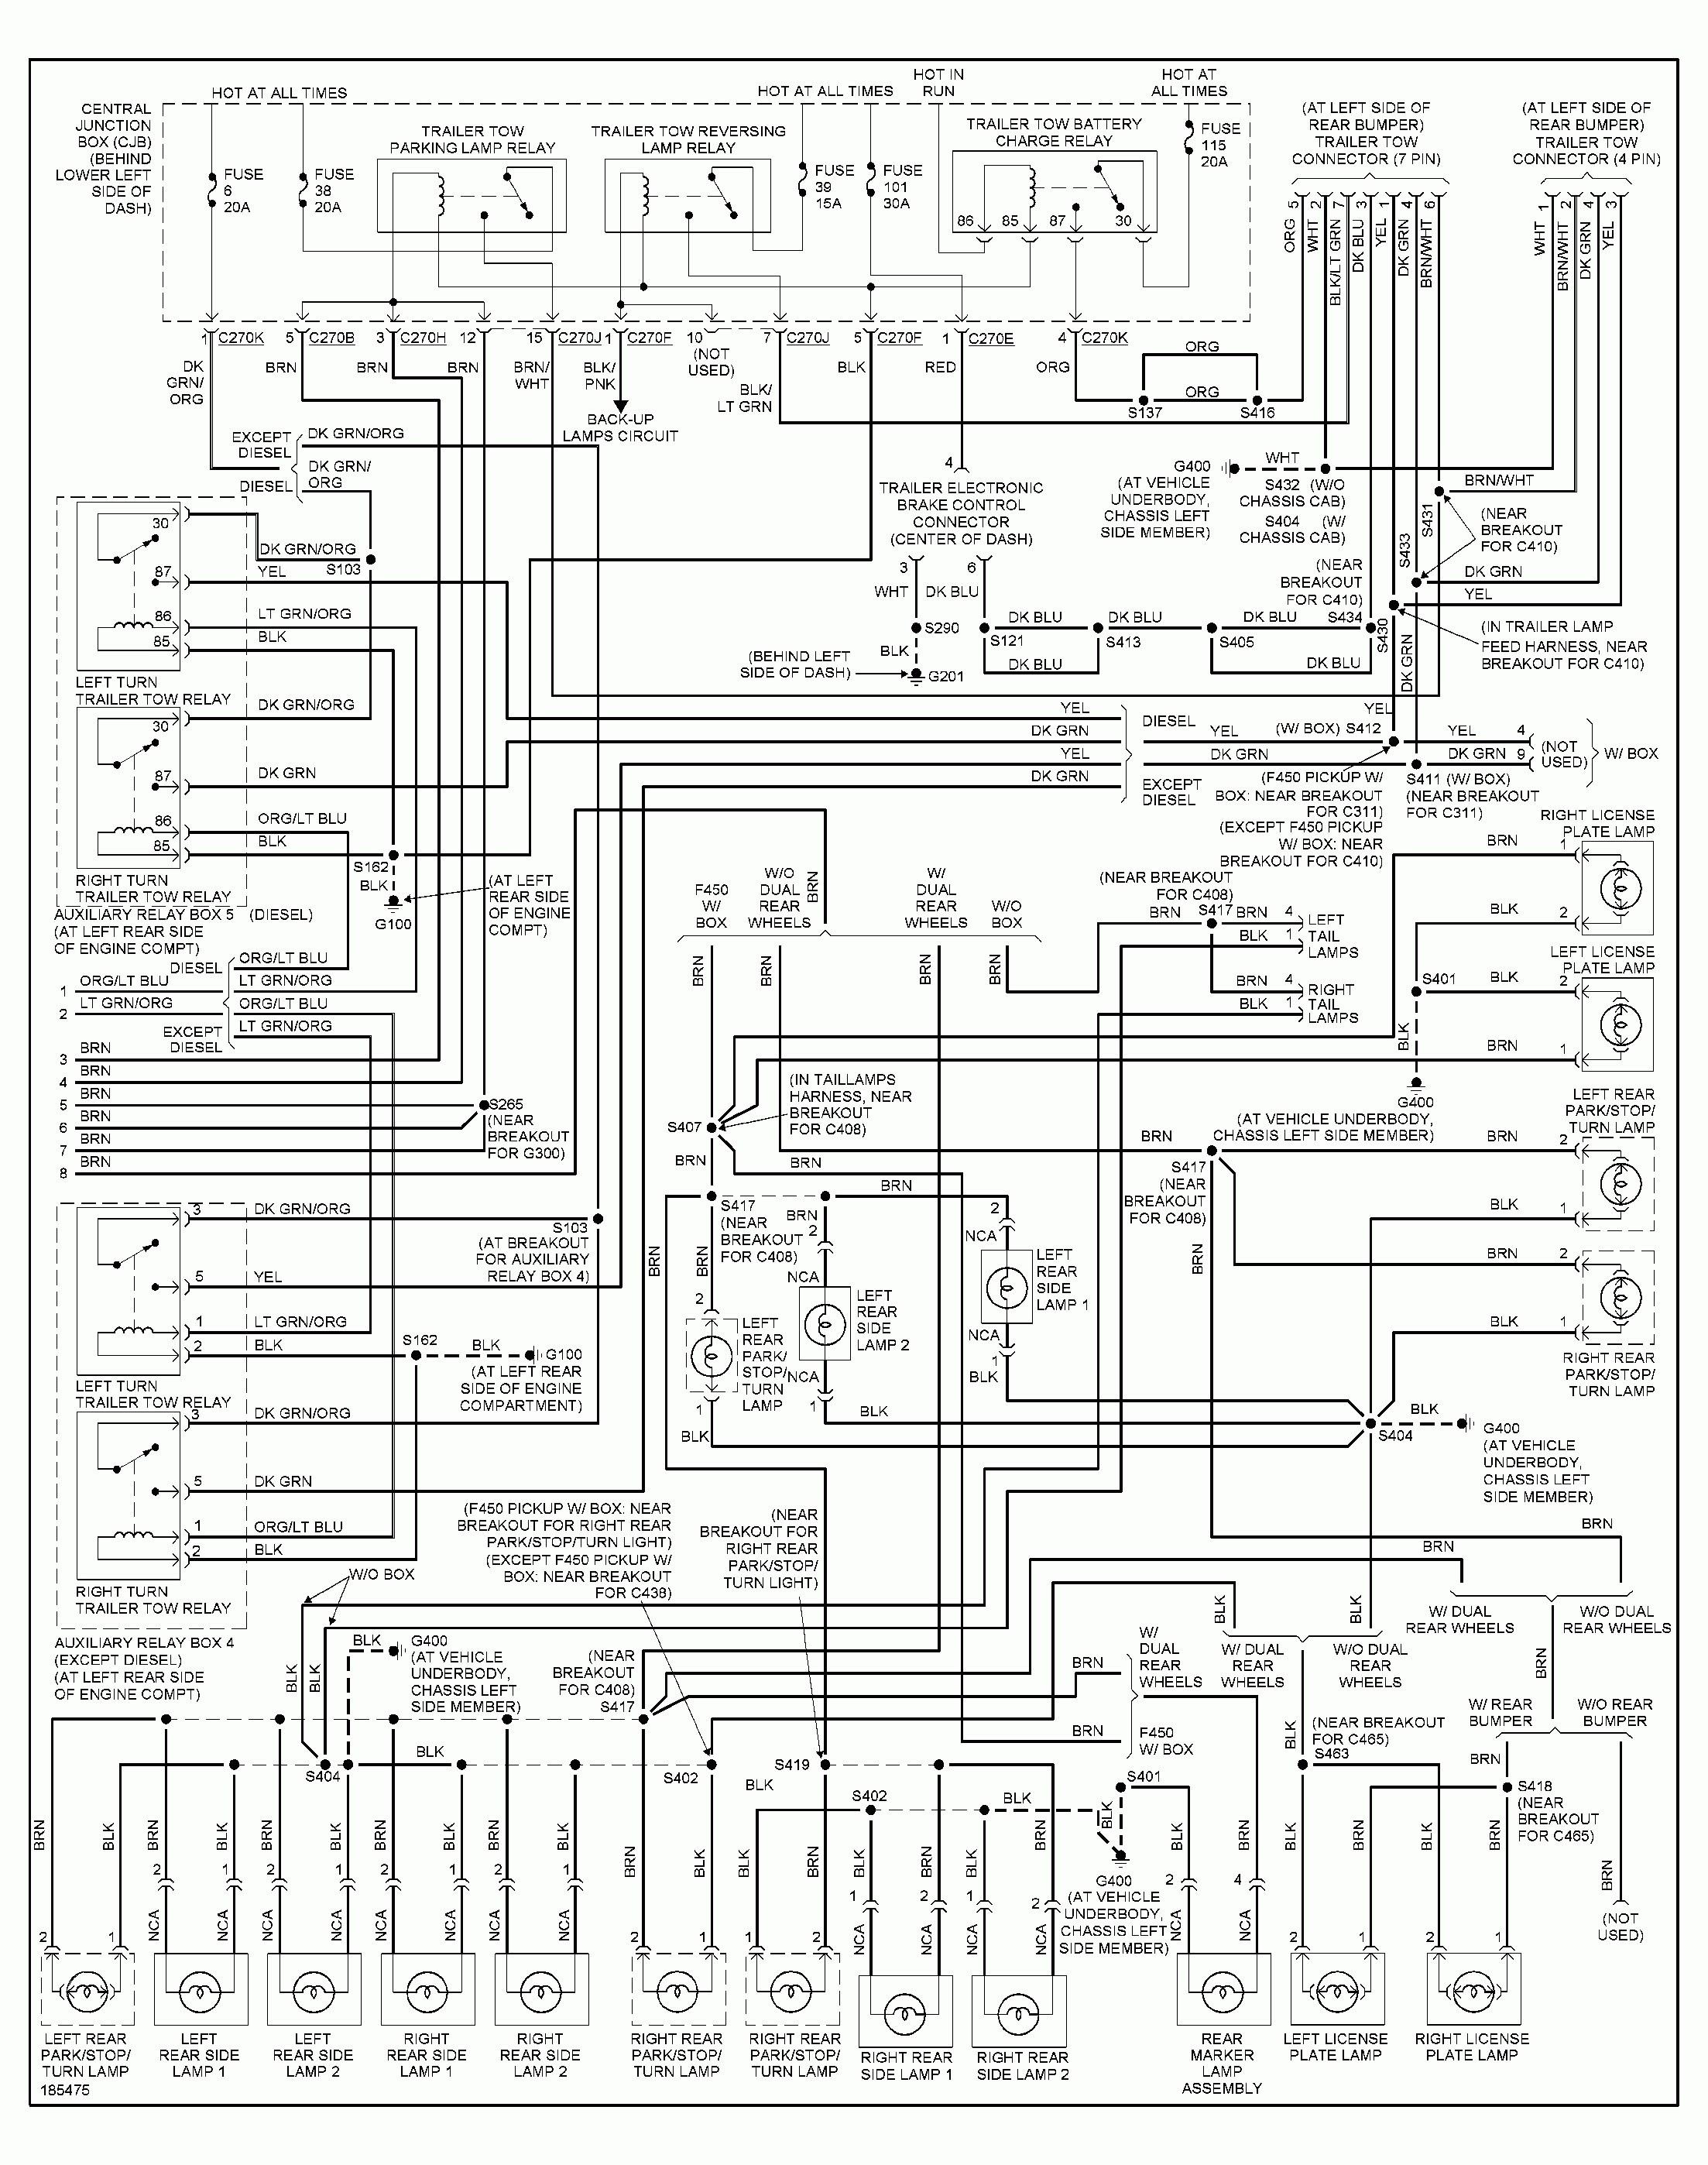 Diagram For A 2000 Mercury Villager Fuse Box Diagram Full Version Hd Quality Box Diagram Militarywirings Efran It